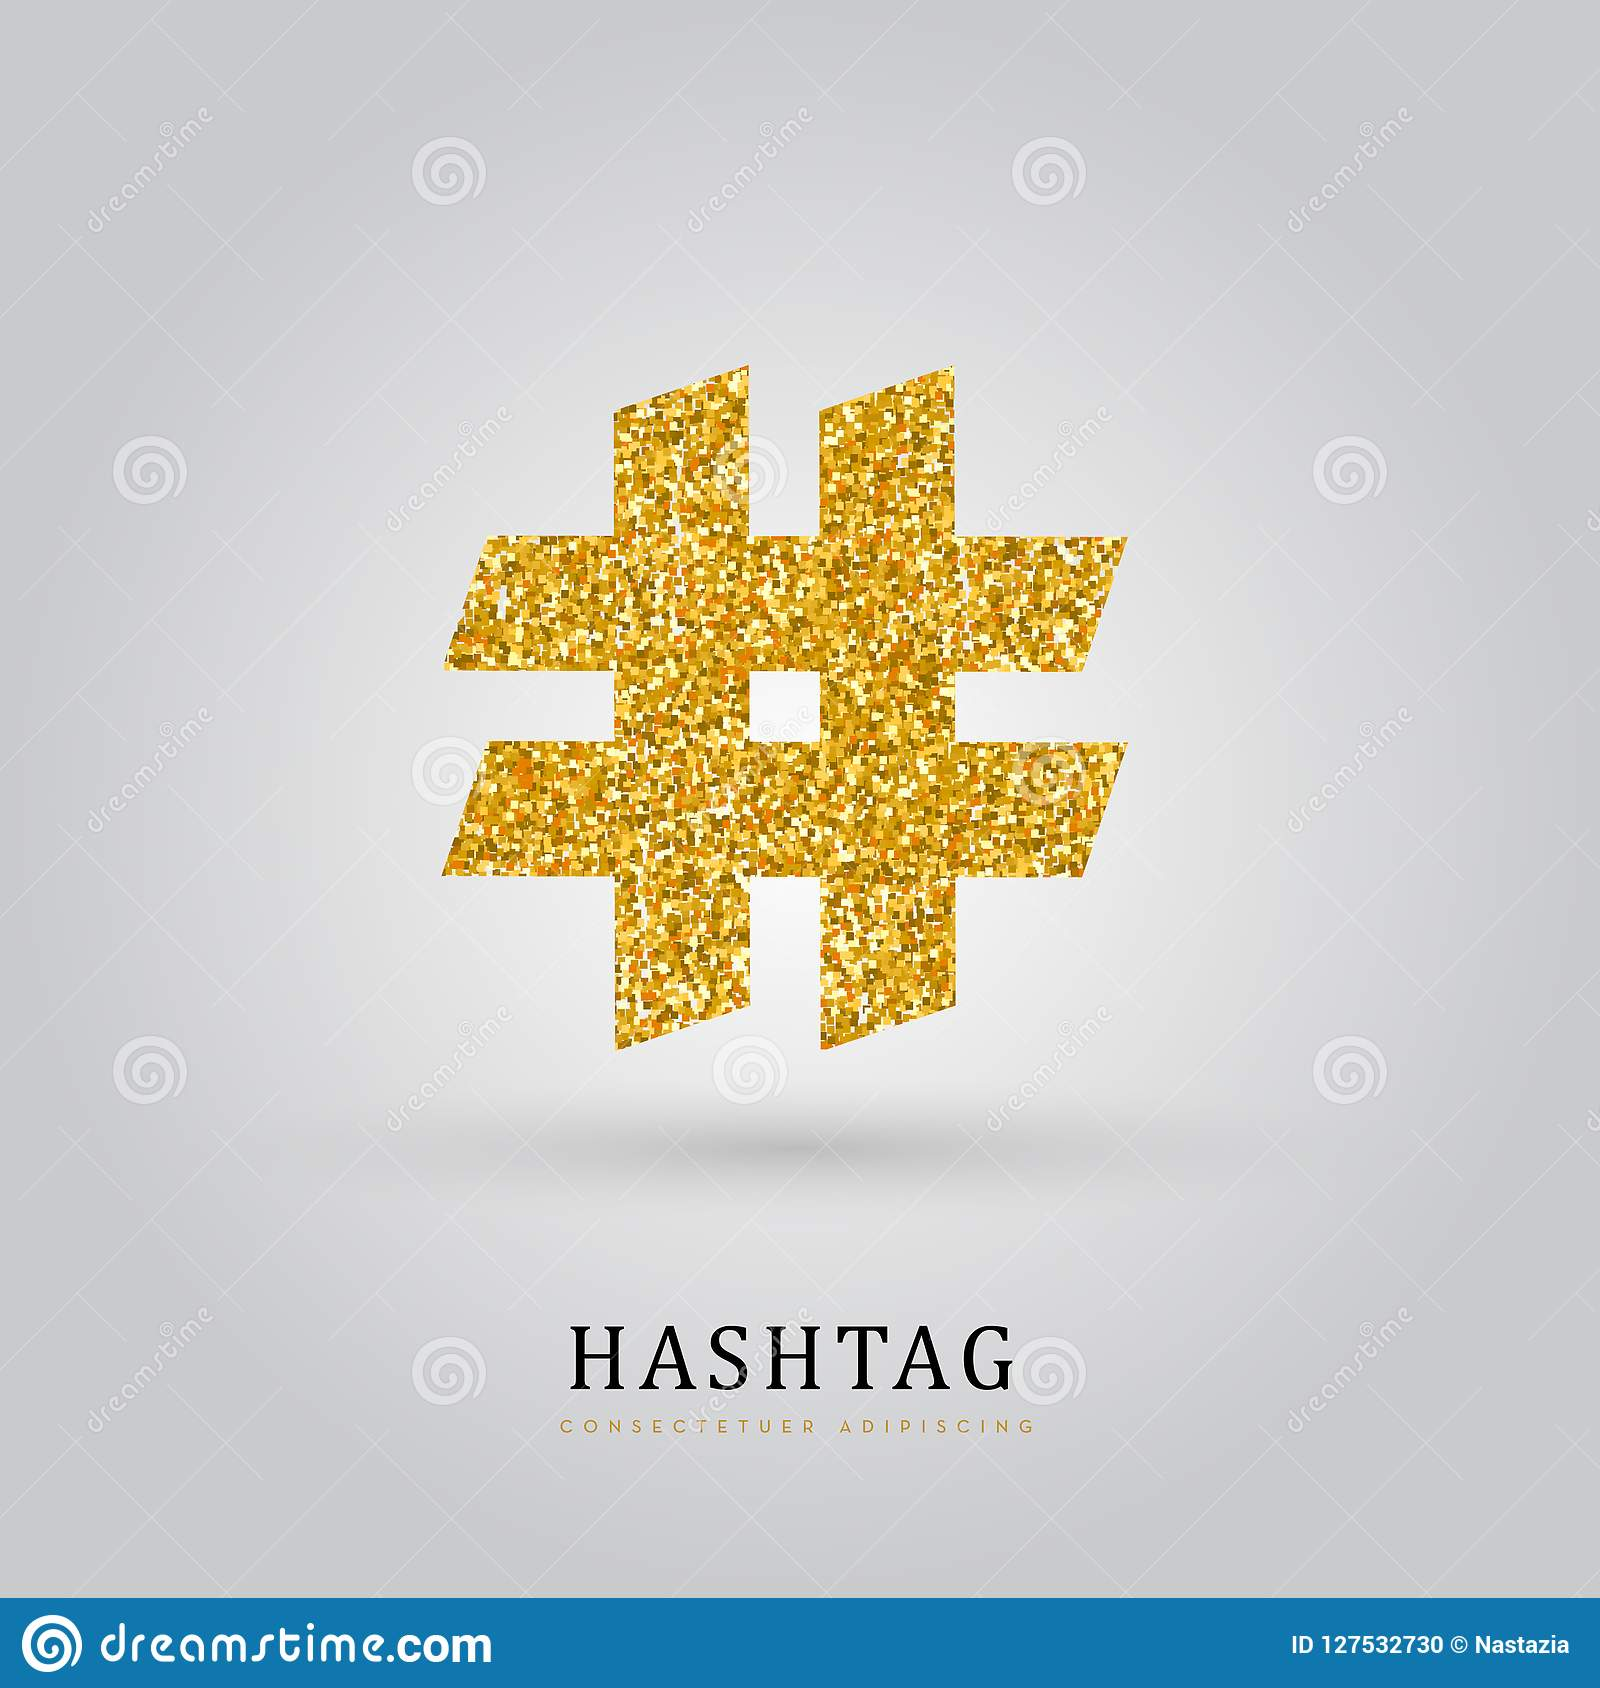 Golden hashtag